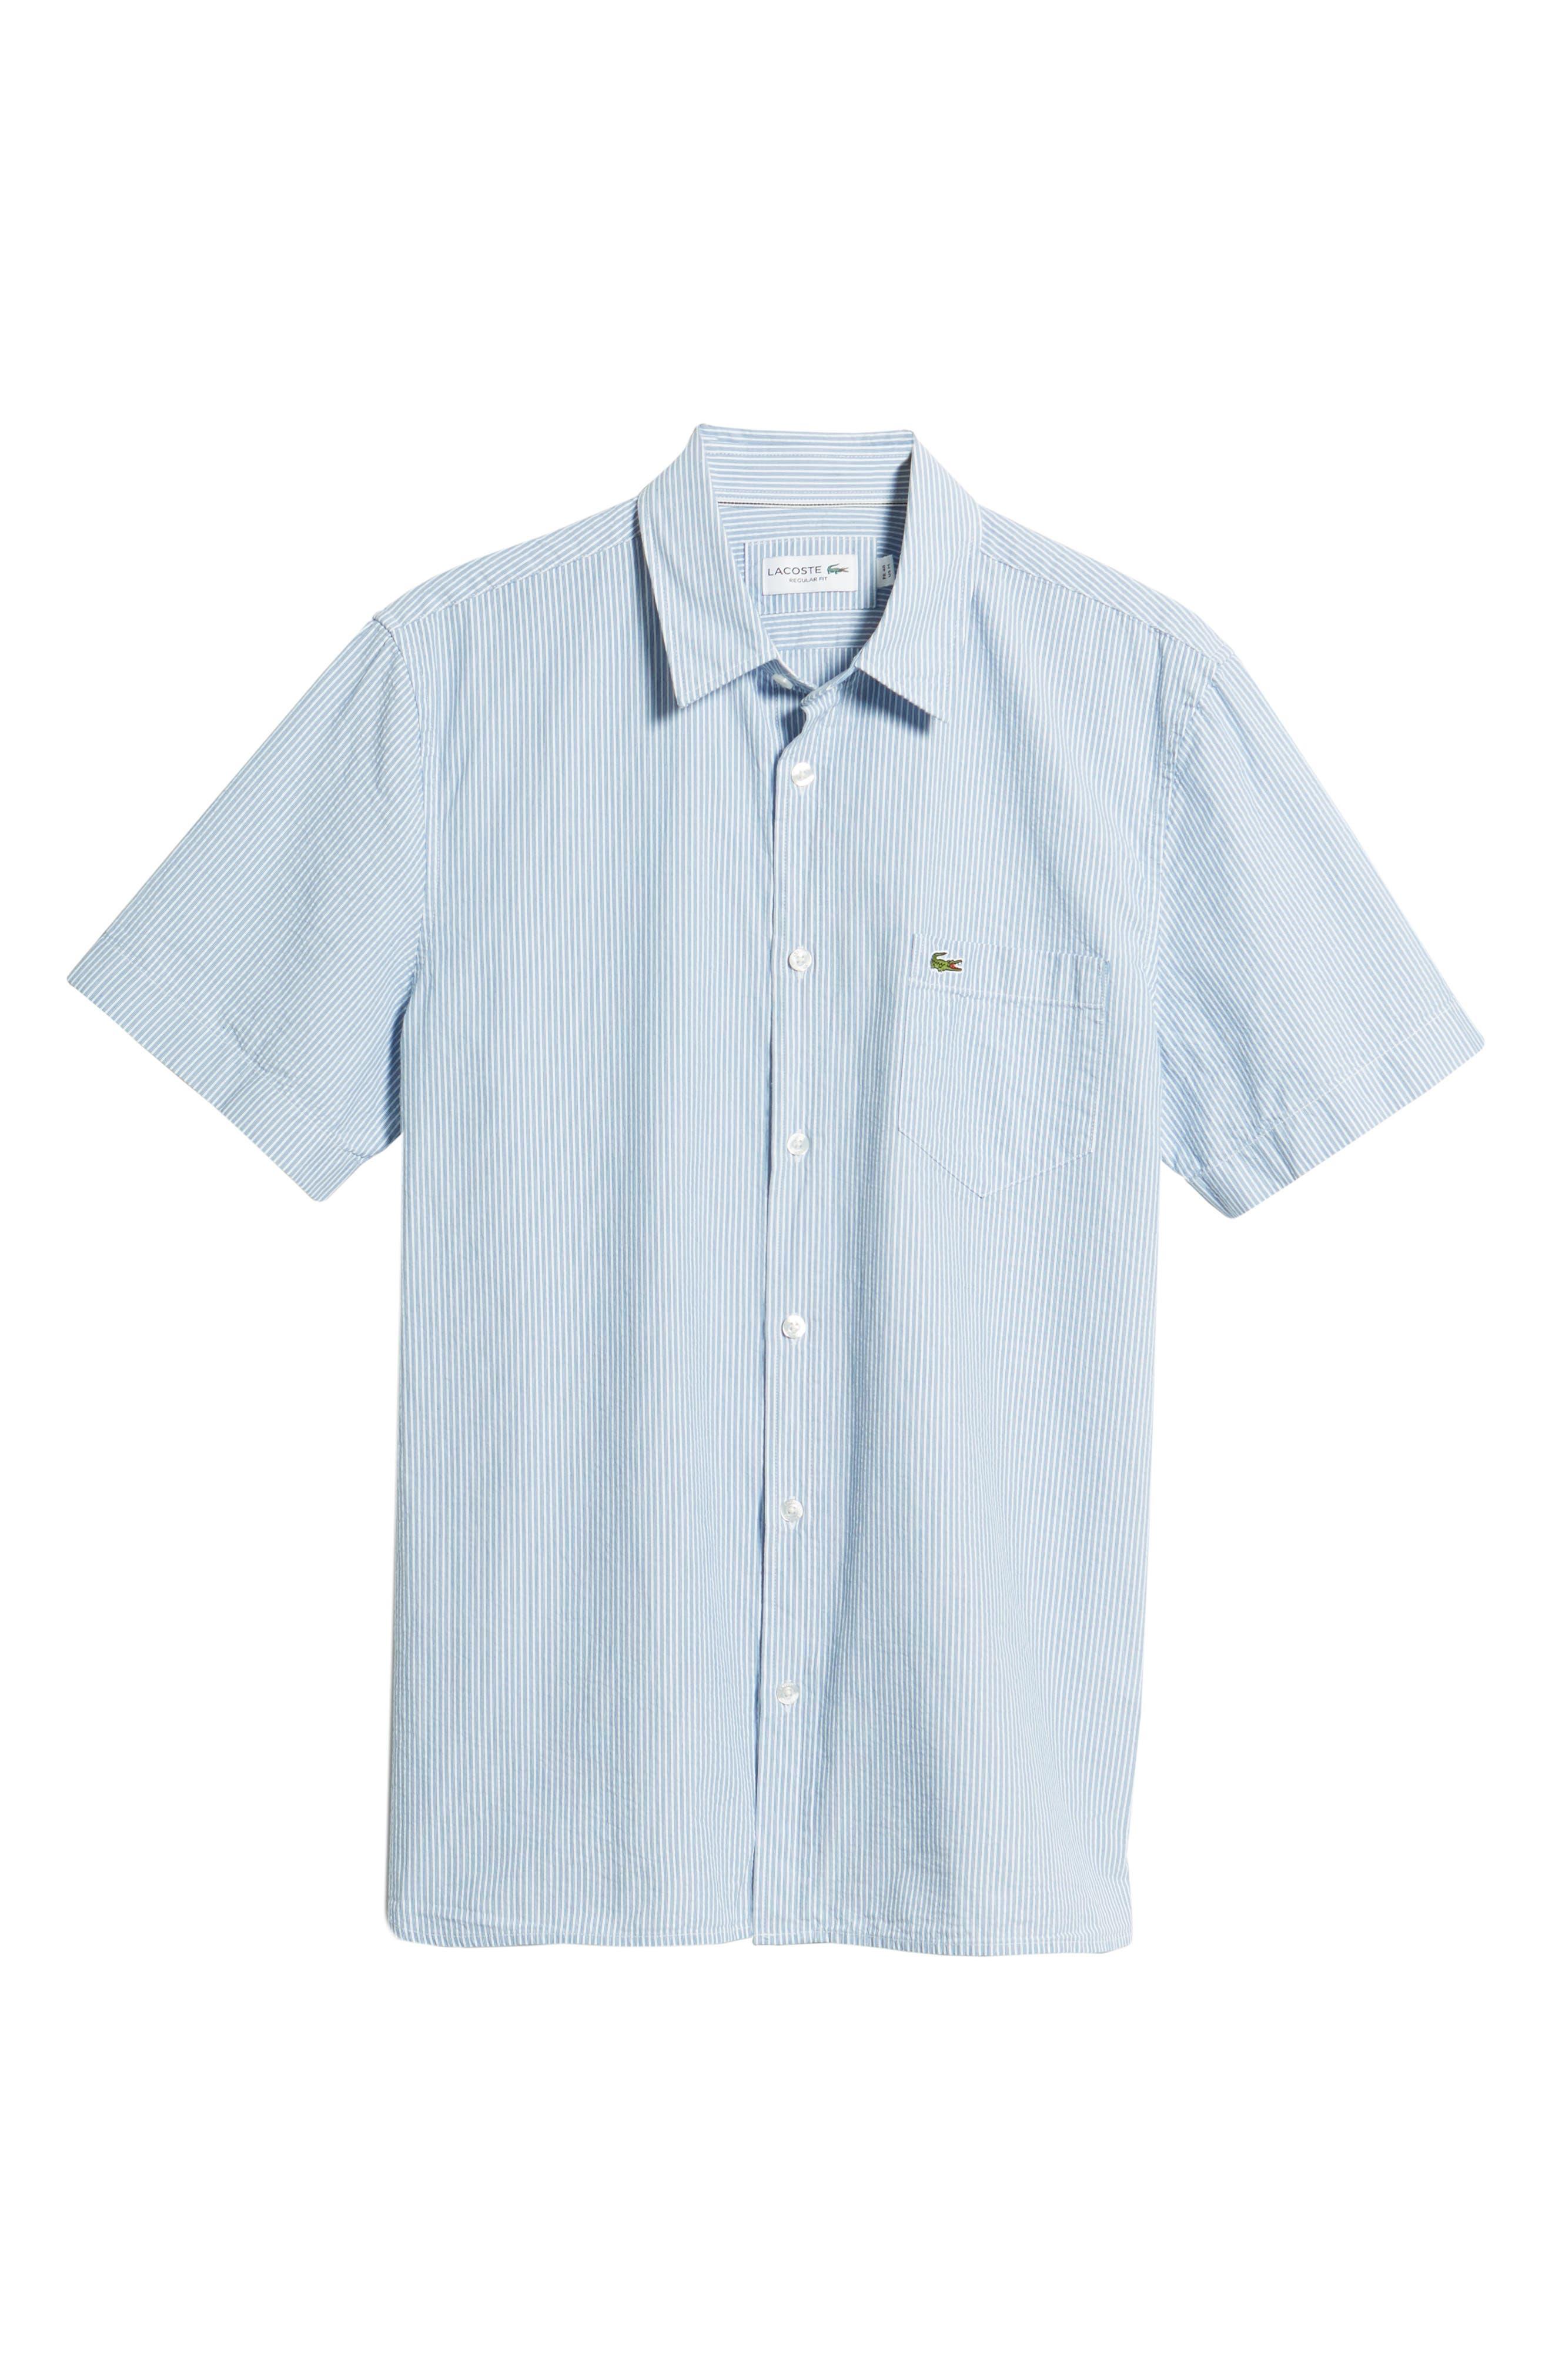 Regular Fit Seersucker Sport Shirt,                             Alternate thumbnail 6, color,                             400